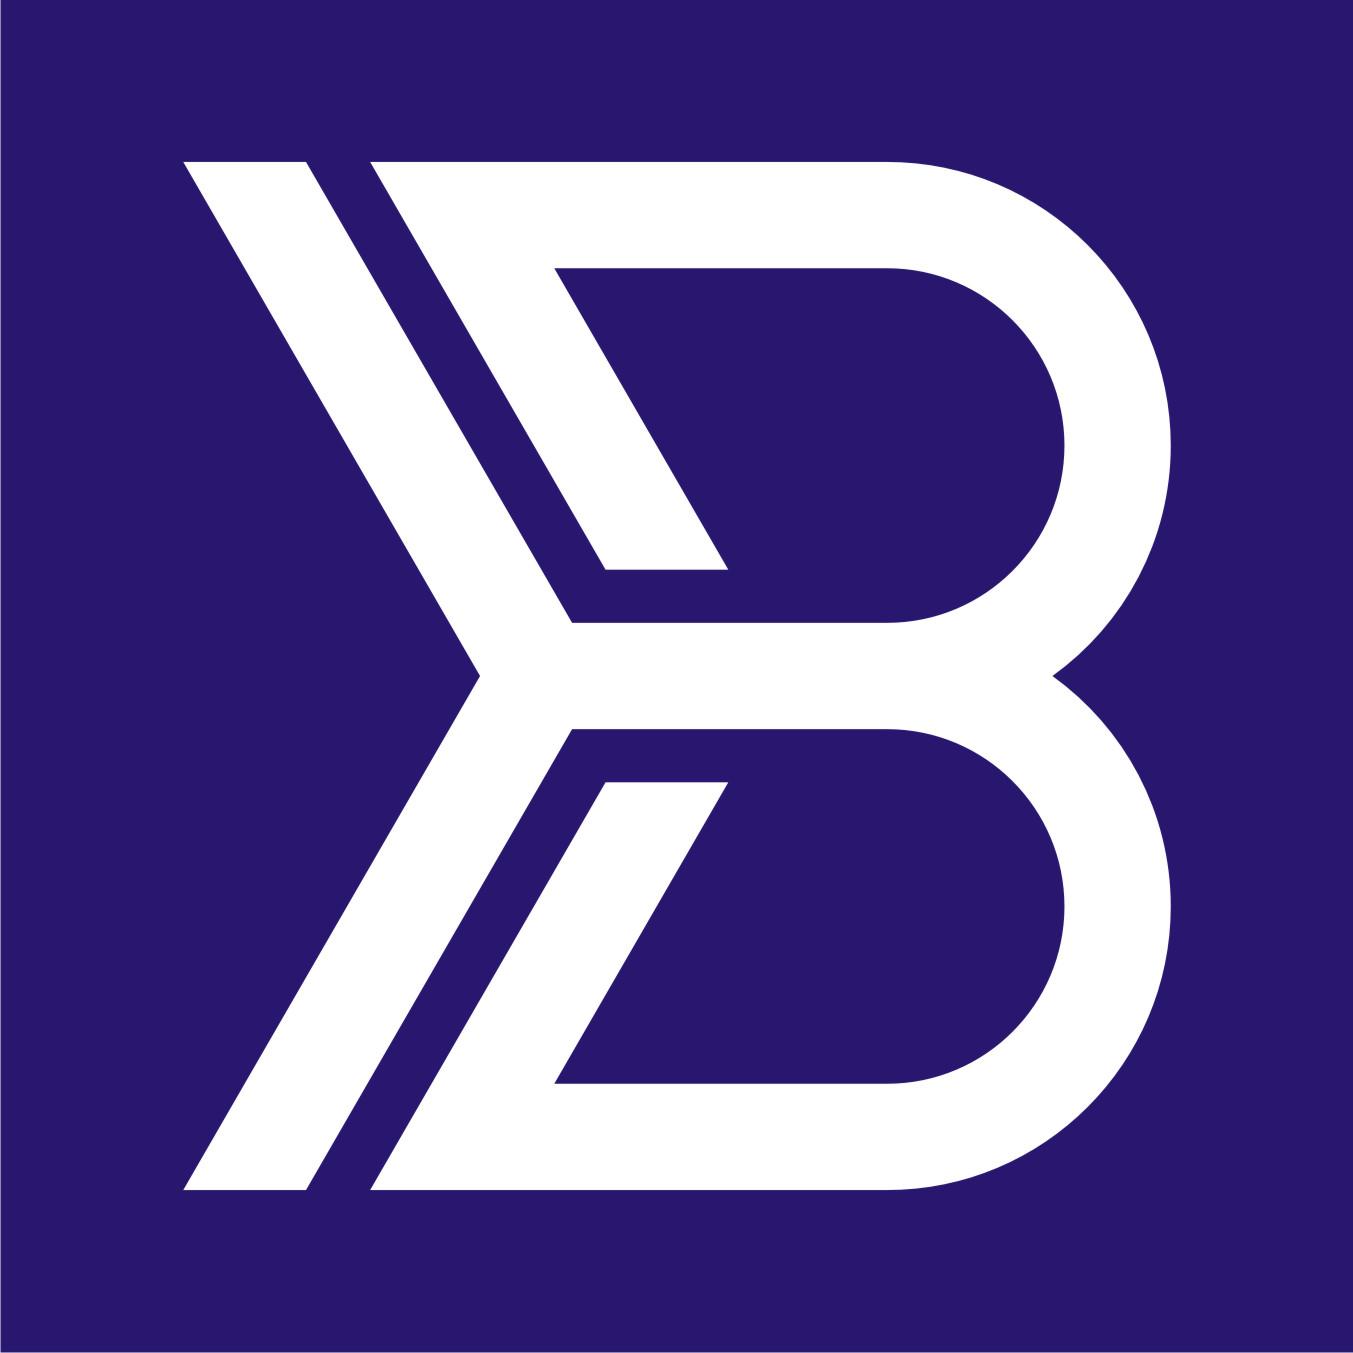 B profile pic